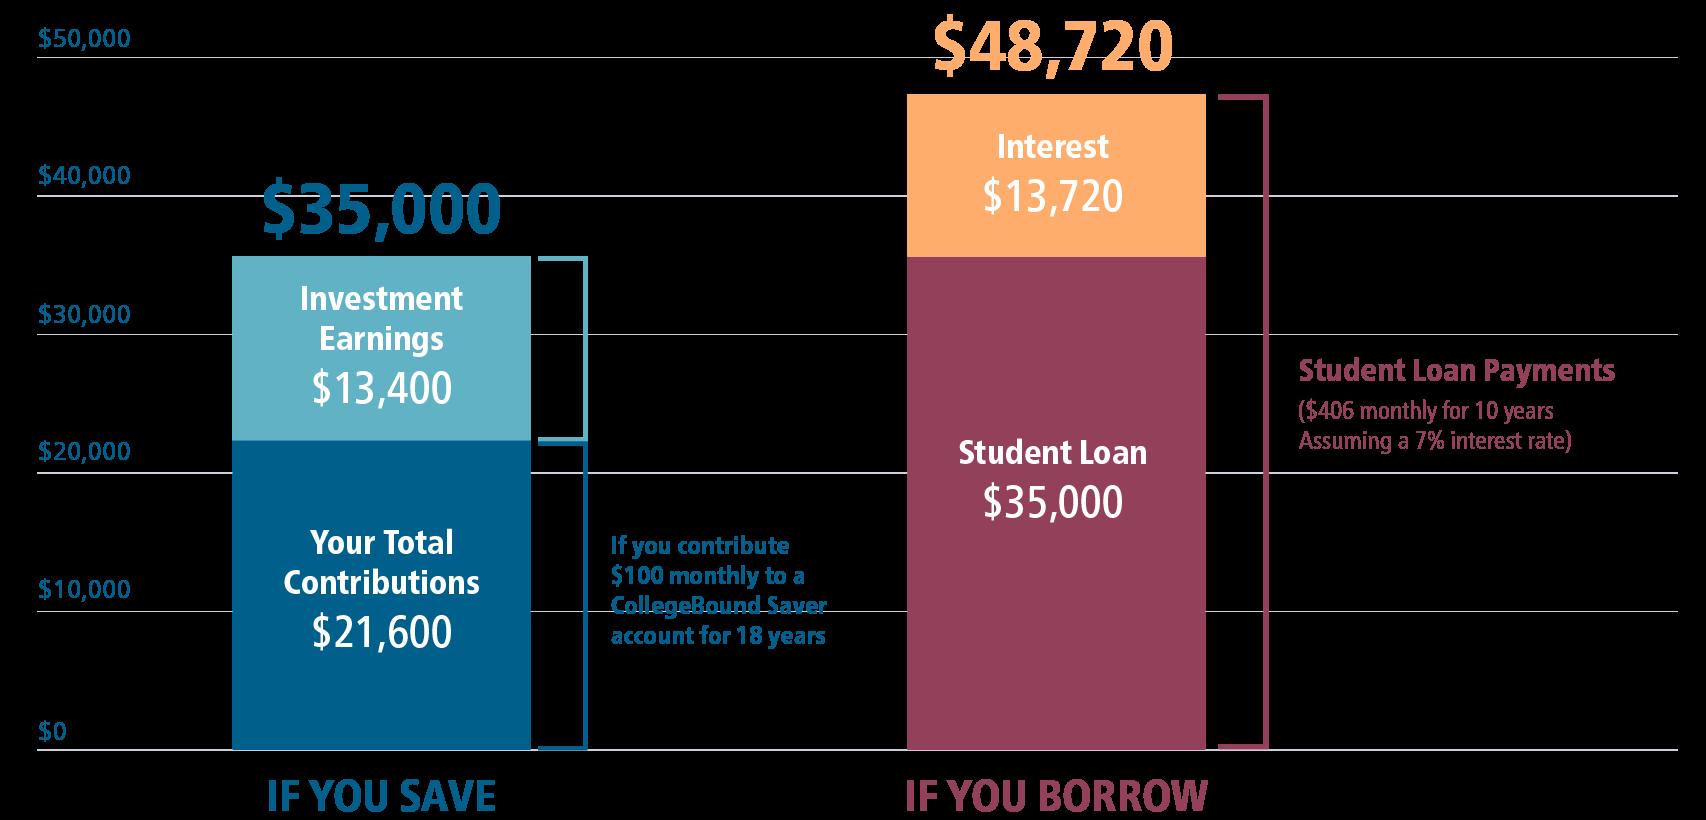 savingvs.borrowingchart.png